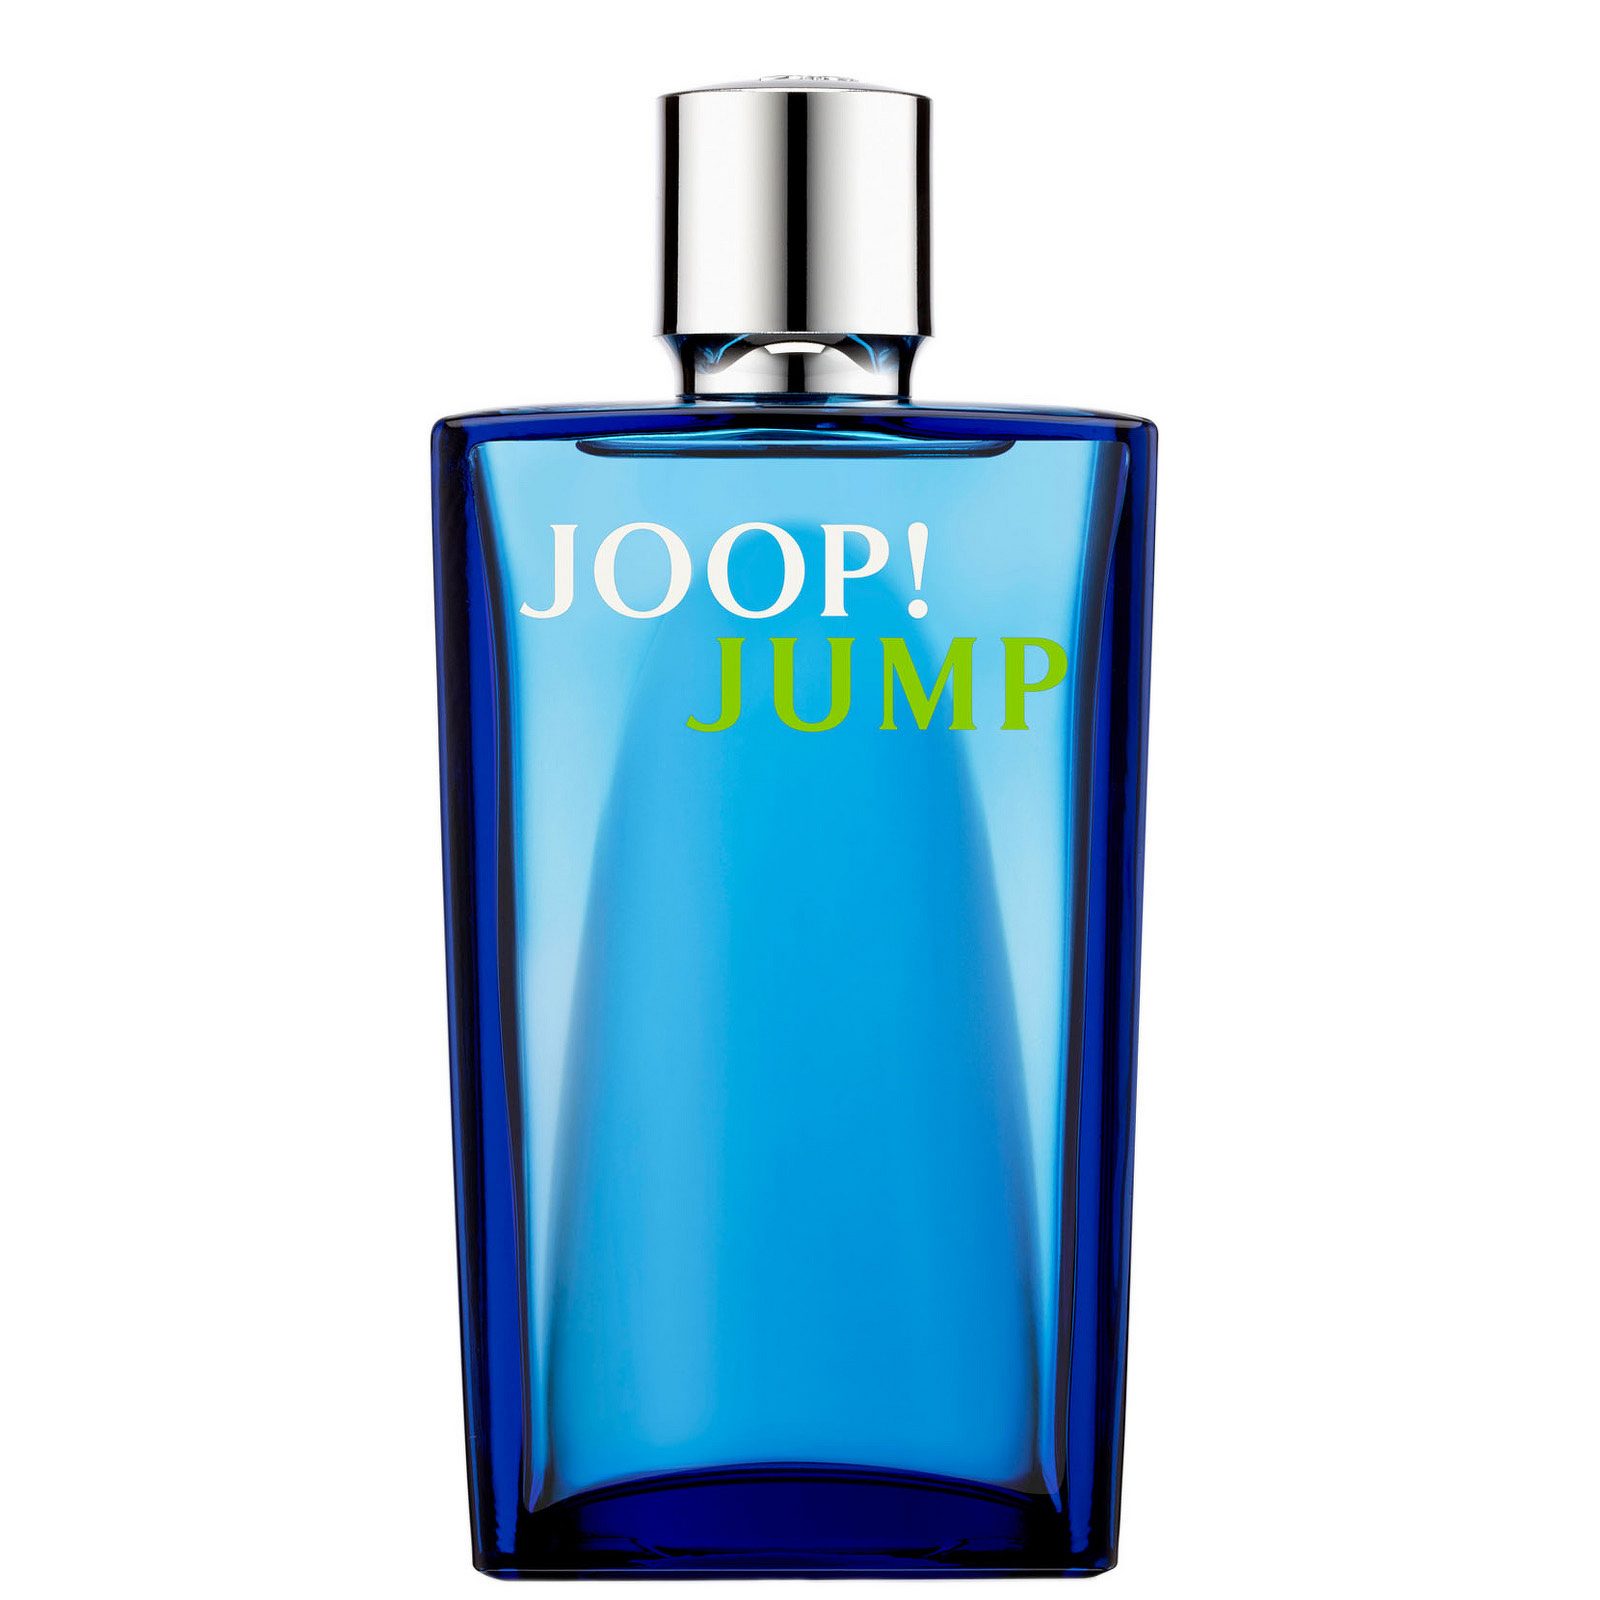 Joop! Jump EDT Spray 100ml for men